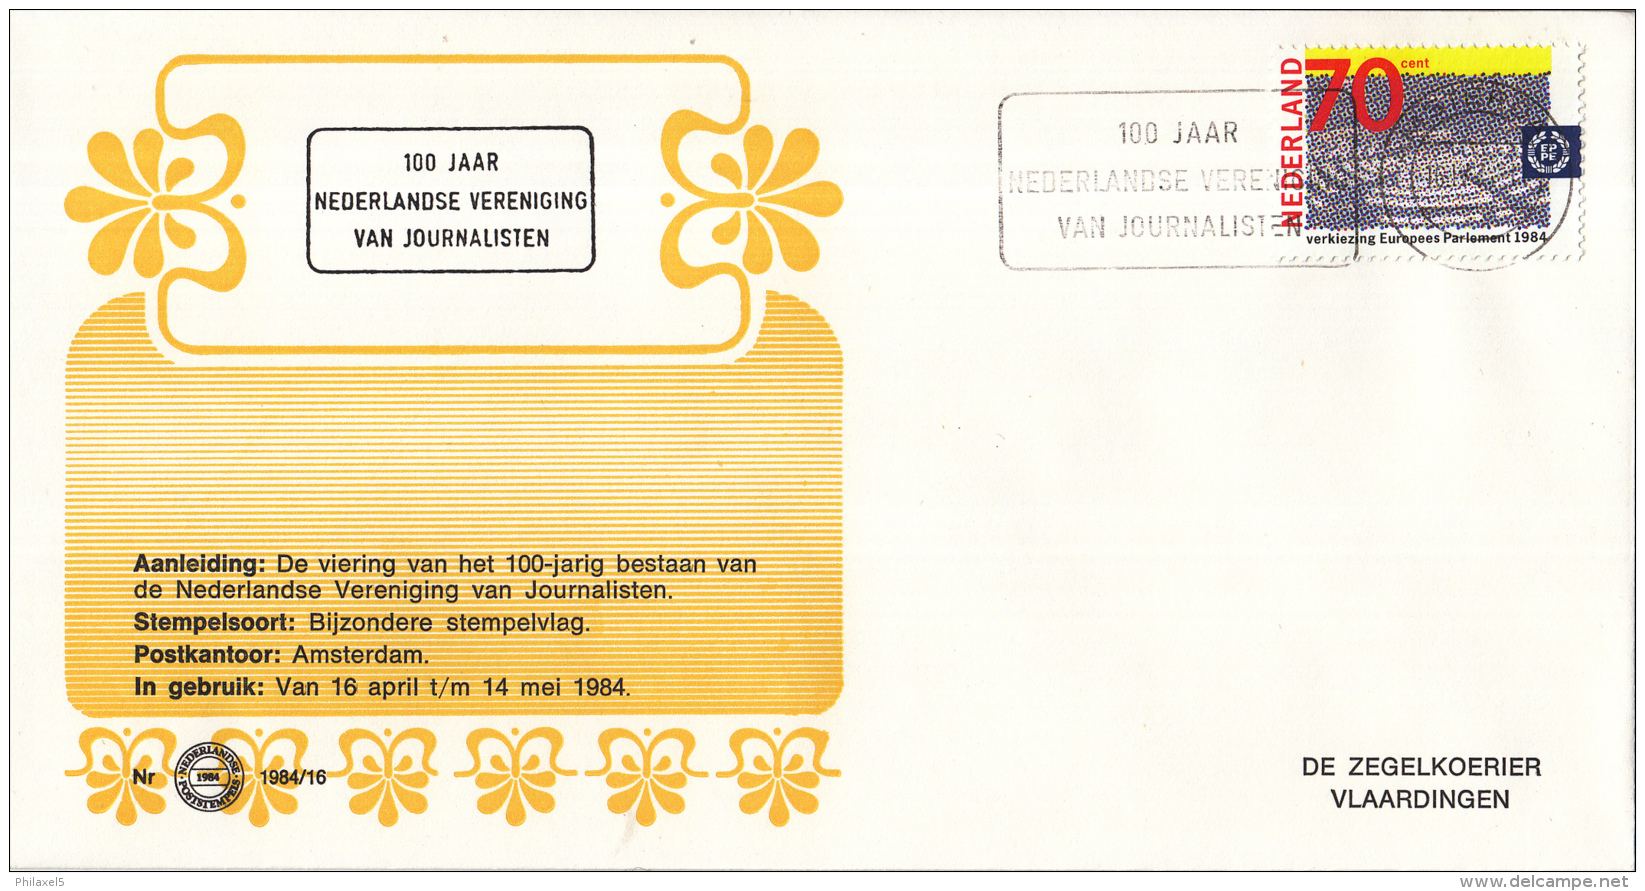 Nederland - Zegelkoerier Nederlandse Poststempels - 100 Jaar Nederlandse Vereniging Van Journalisten -  Nr. 1984/16 - Marcofilie - EMA (Print Machine)